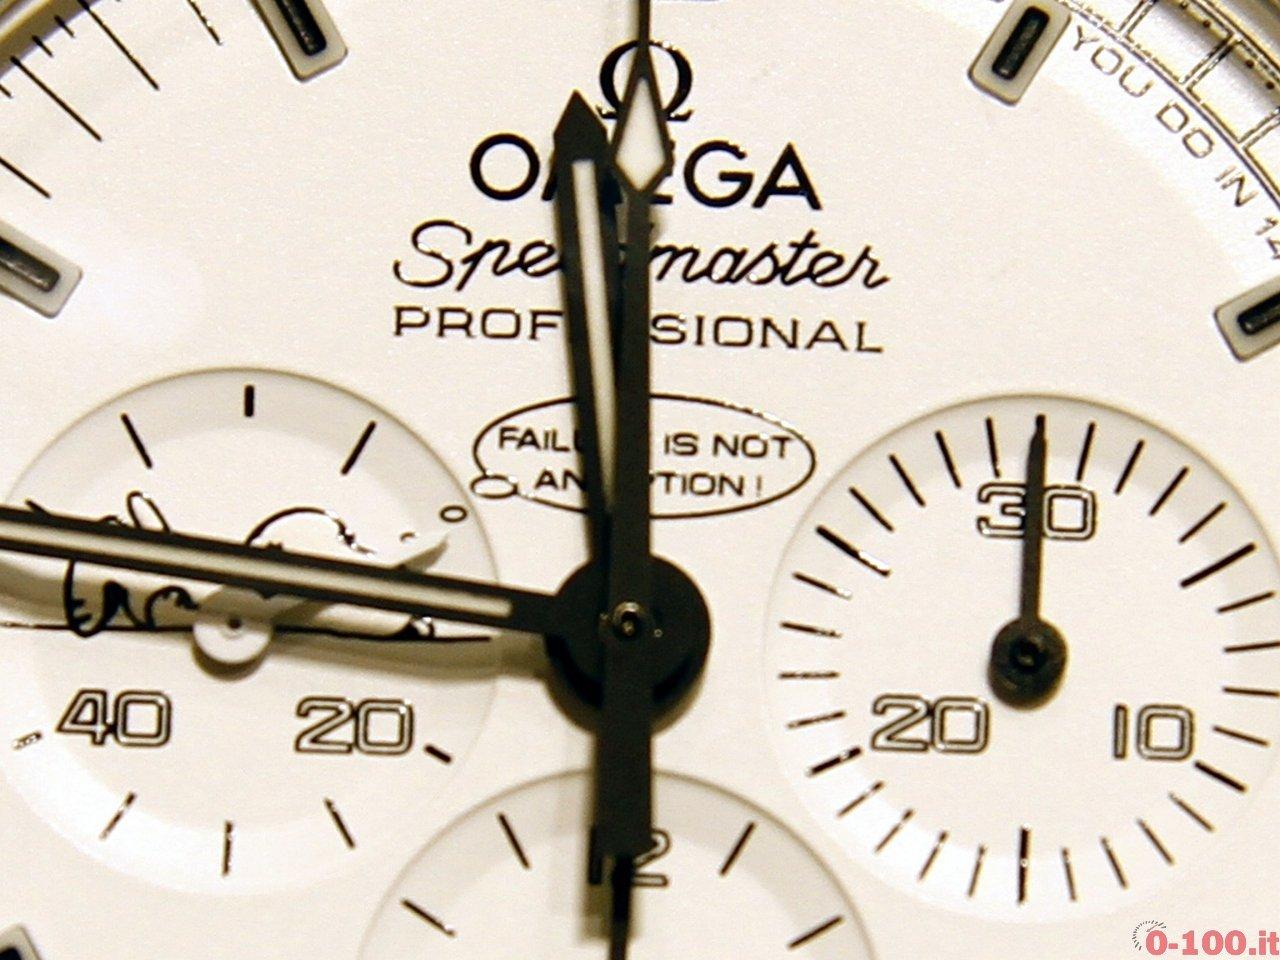 baselworld-2015-omega-speedmaster-moonwatch-apollo-14-snoopy-0-100_5